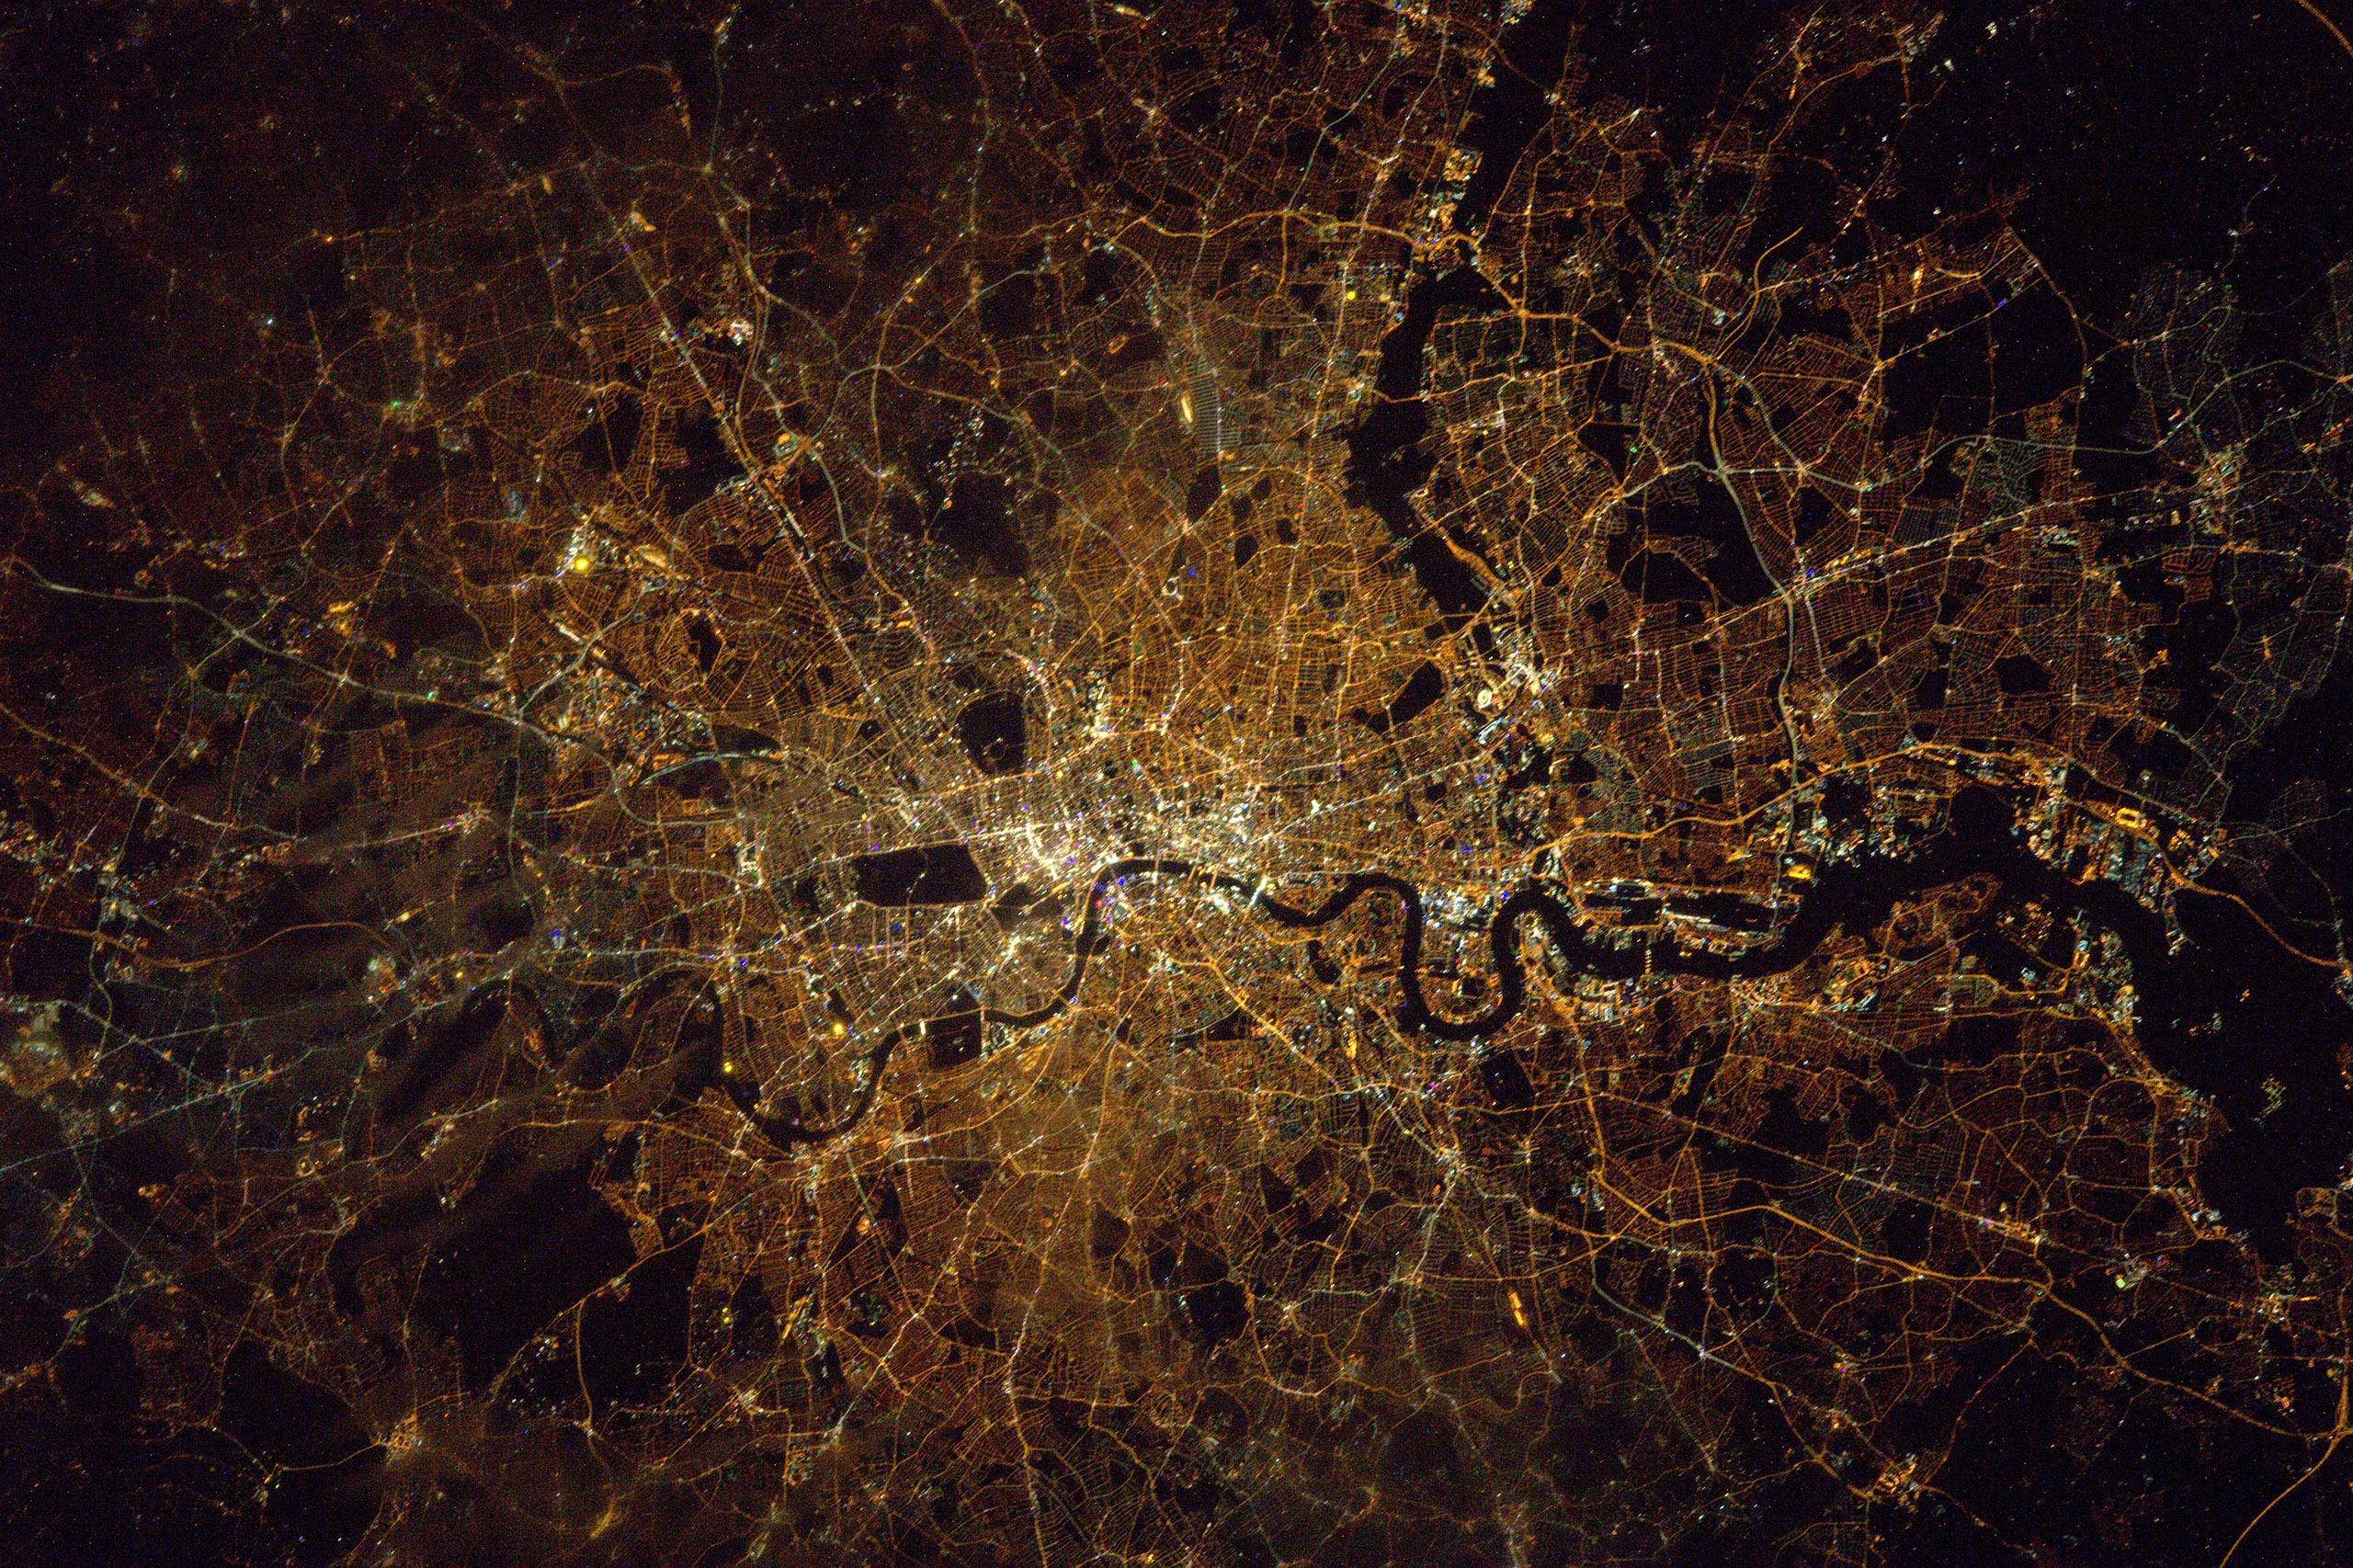 London at midnight, Jan. 30, 2016.